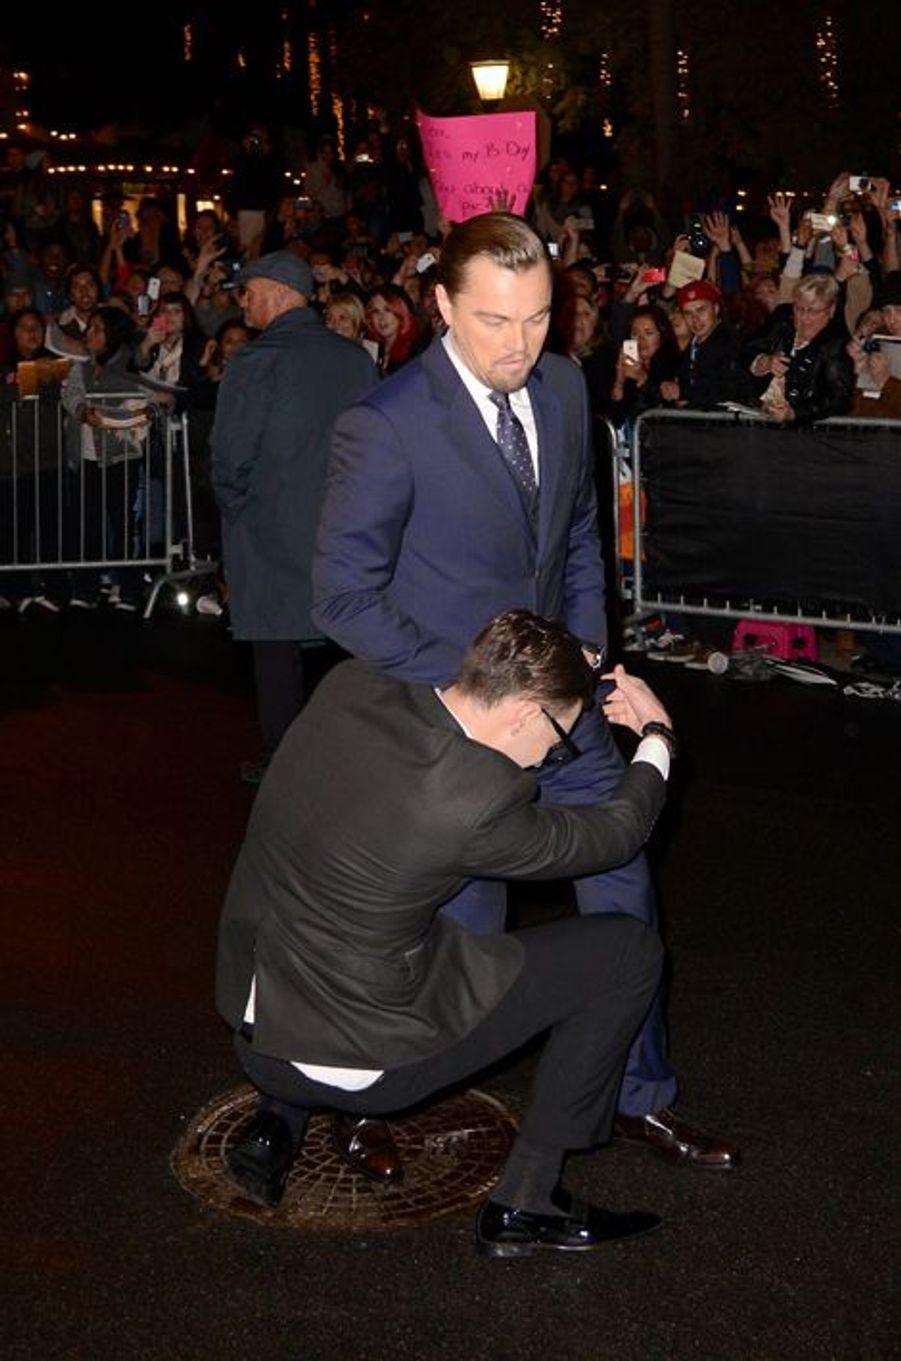 Collé-serré à Leonardo Dicaprio au Festival du film de Santa Barbara, le 5 février dernier